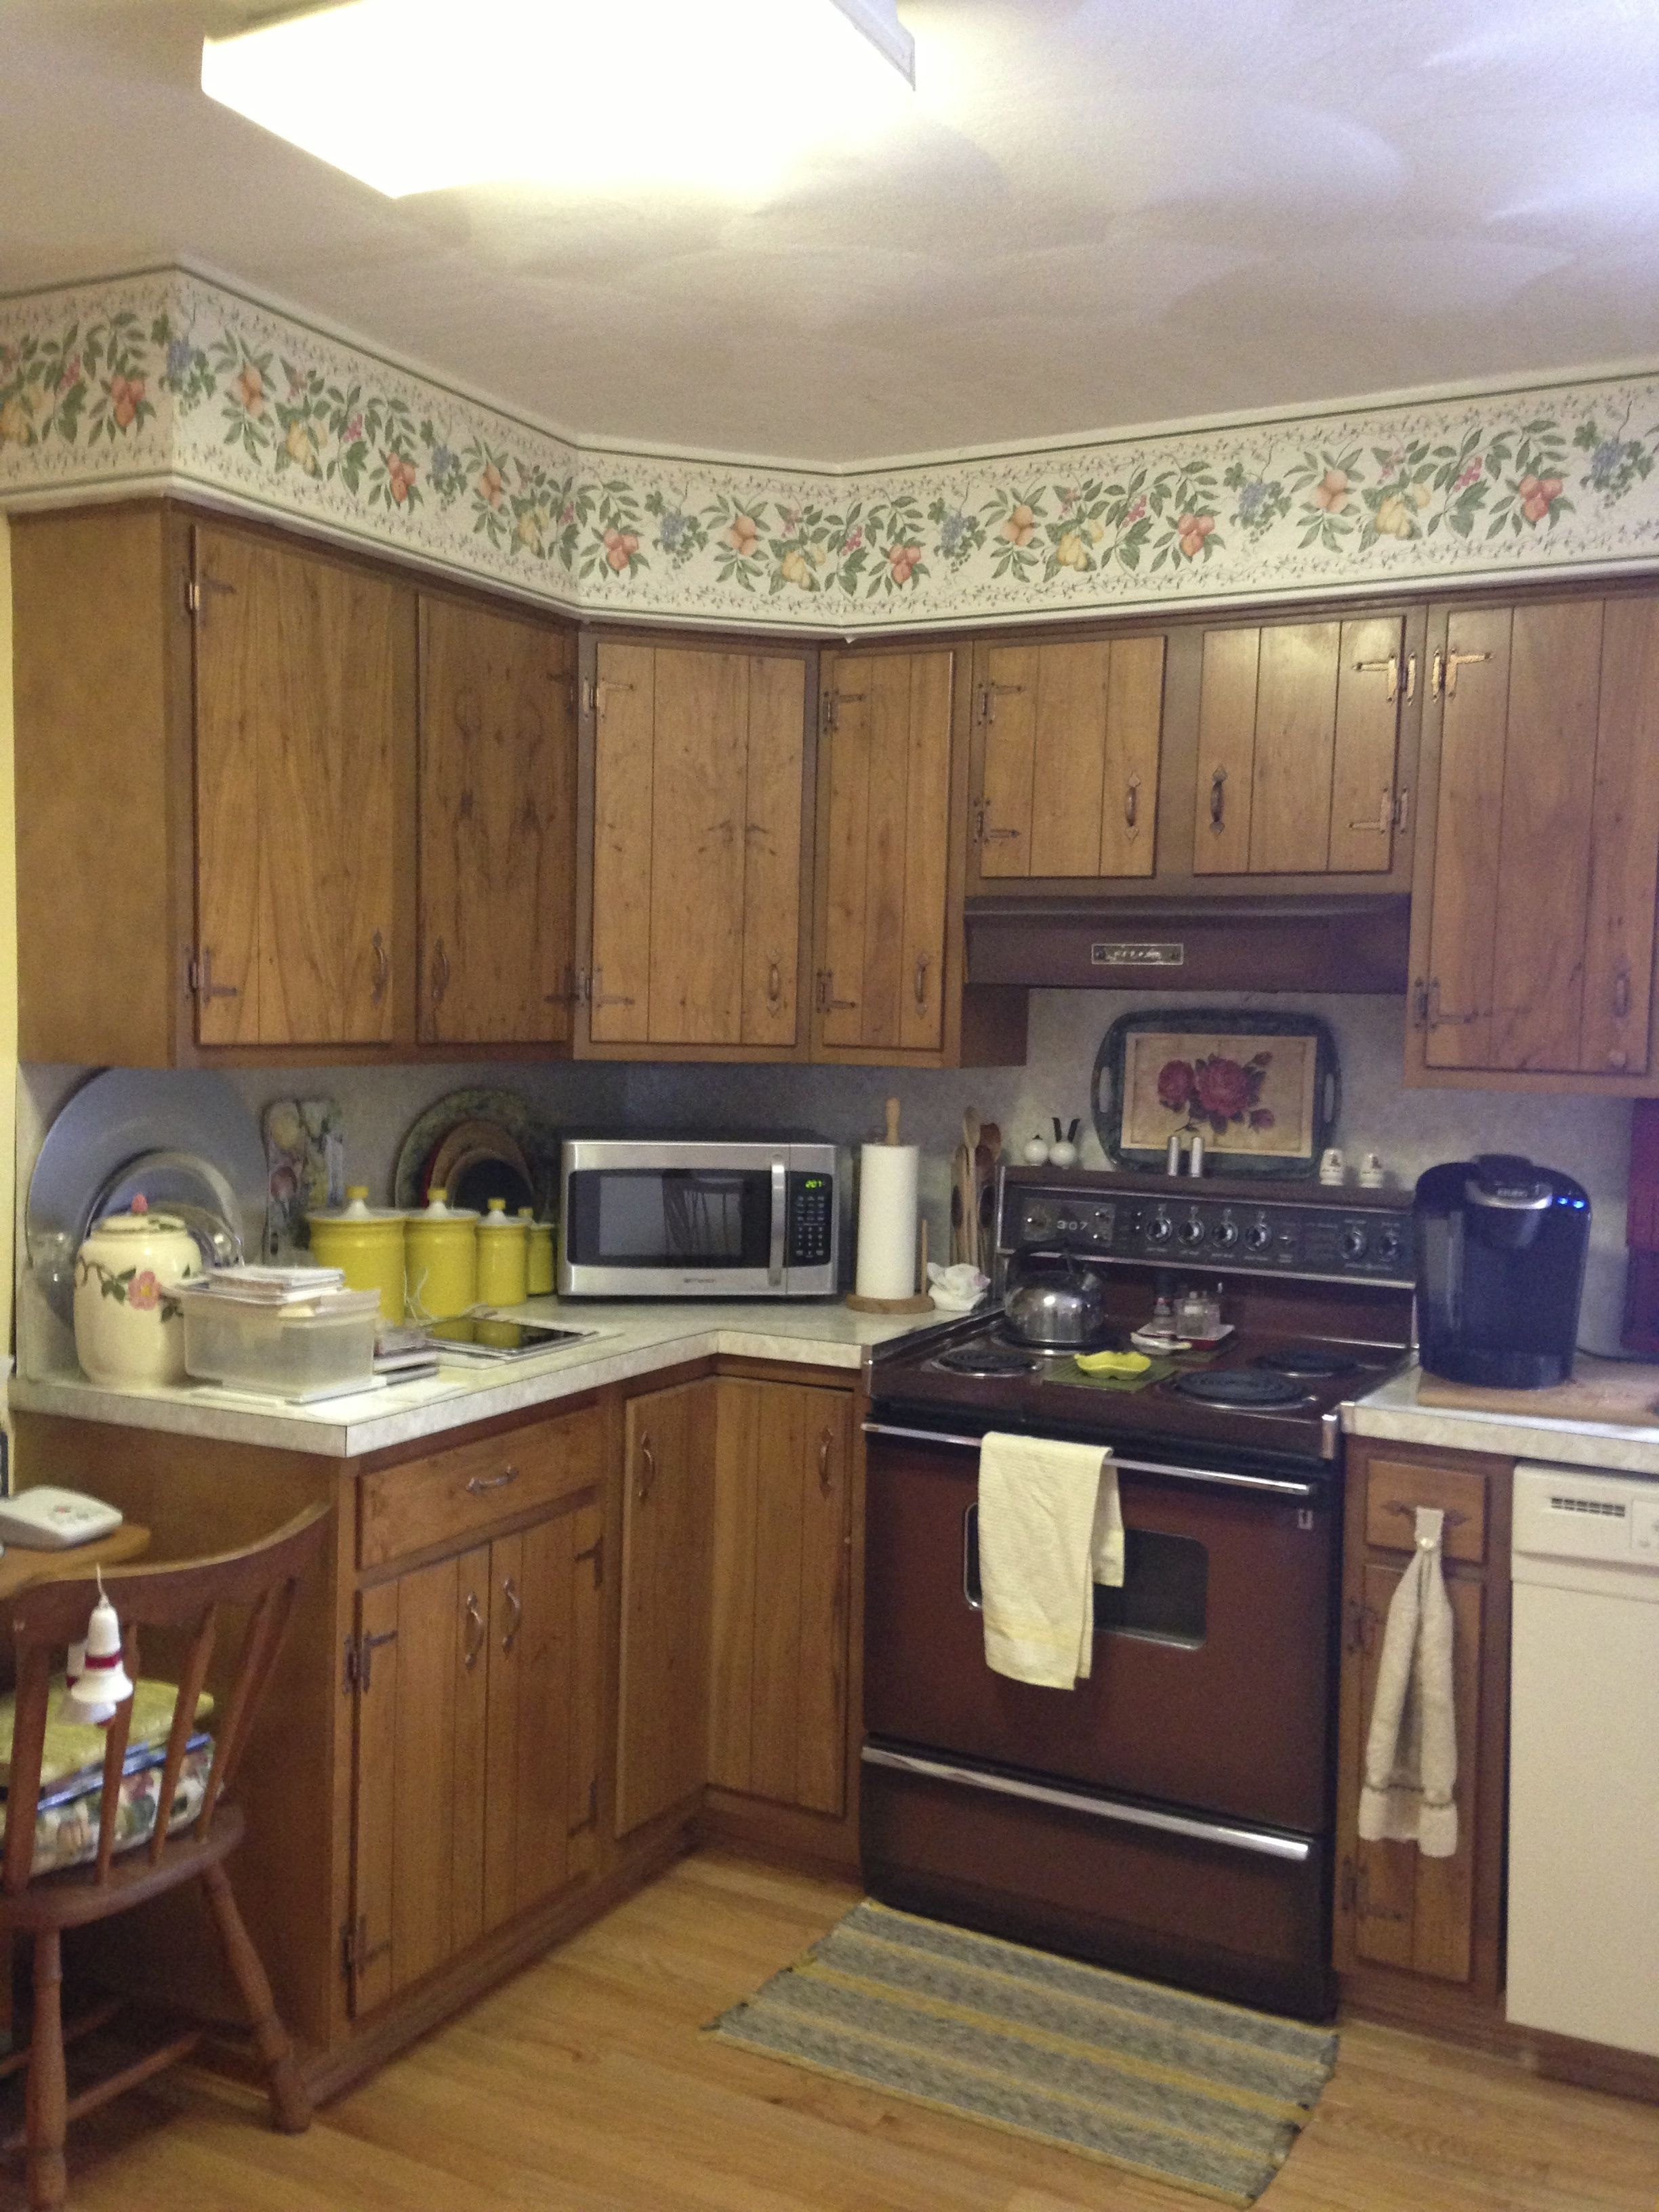 The Old Kitchen Kitchen New Kitchen Old Kitchen